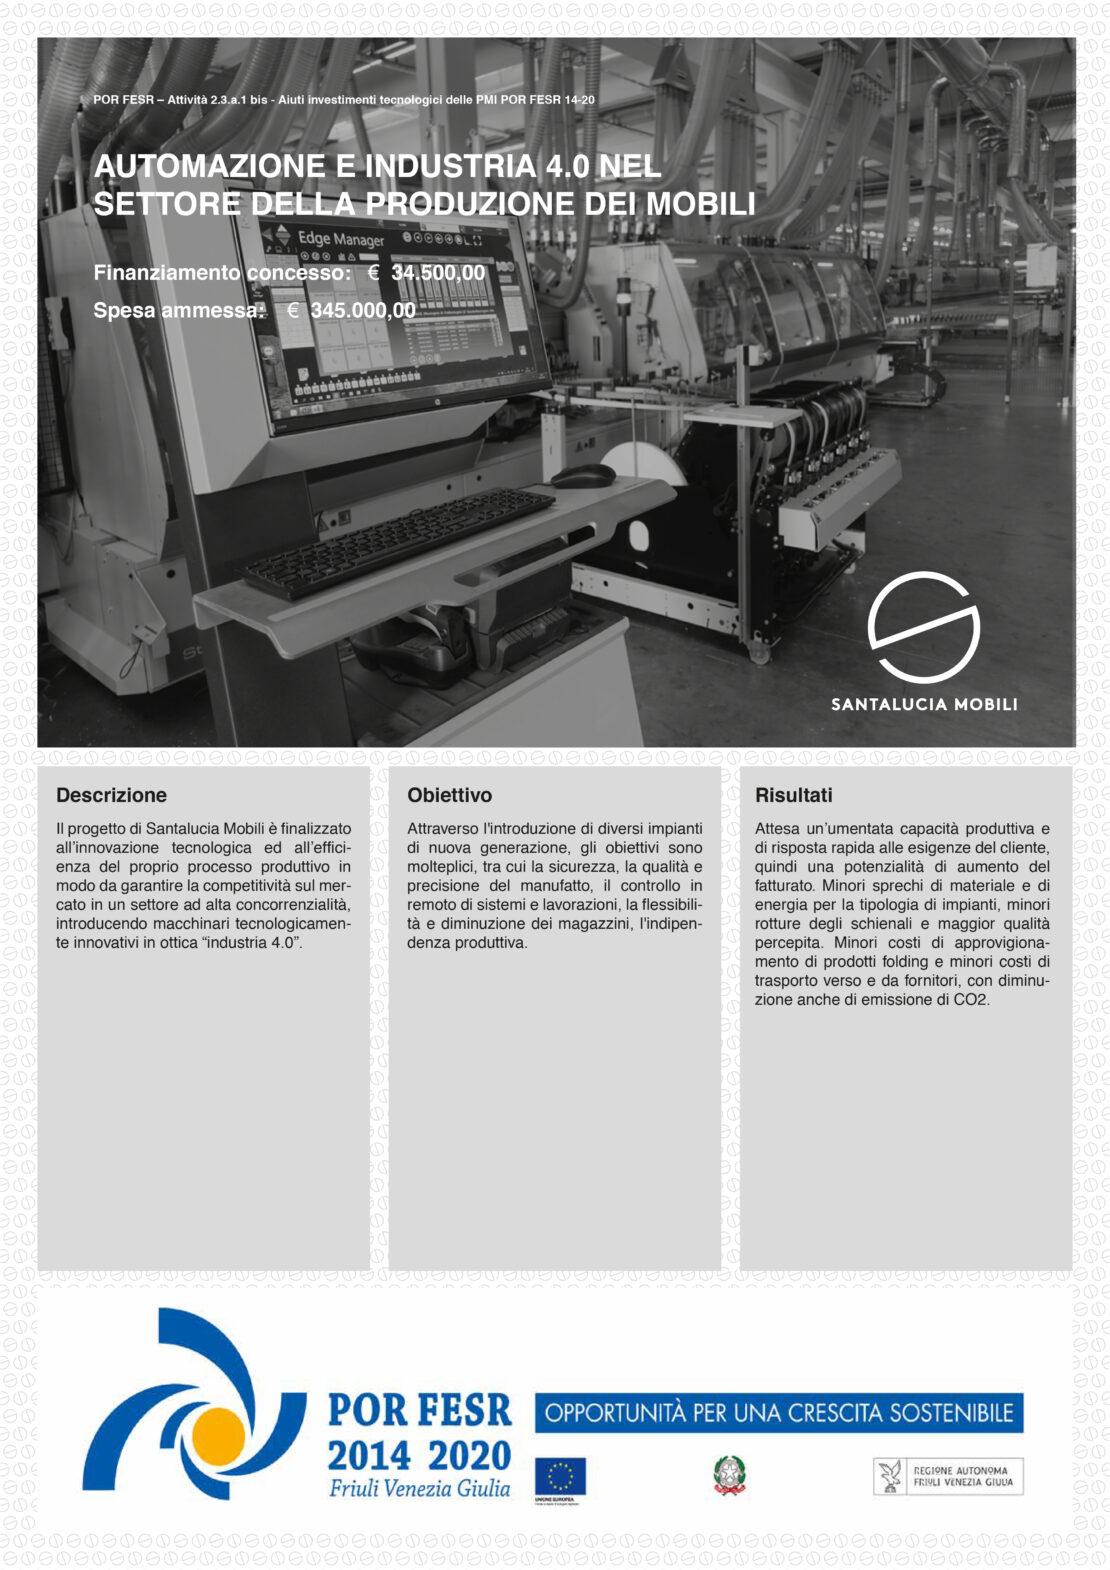 POR FESR Industria 4.0